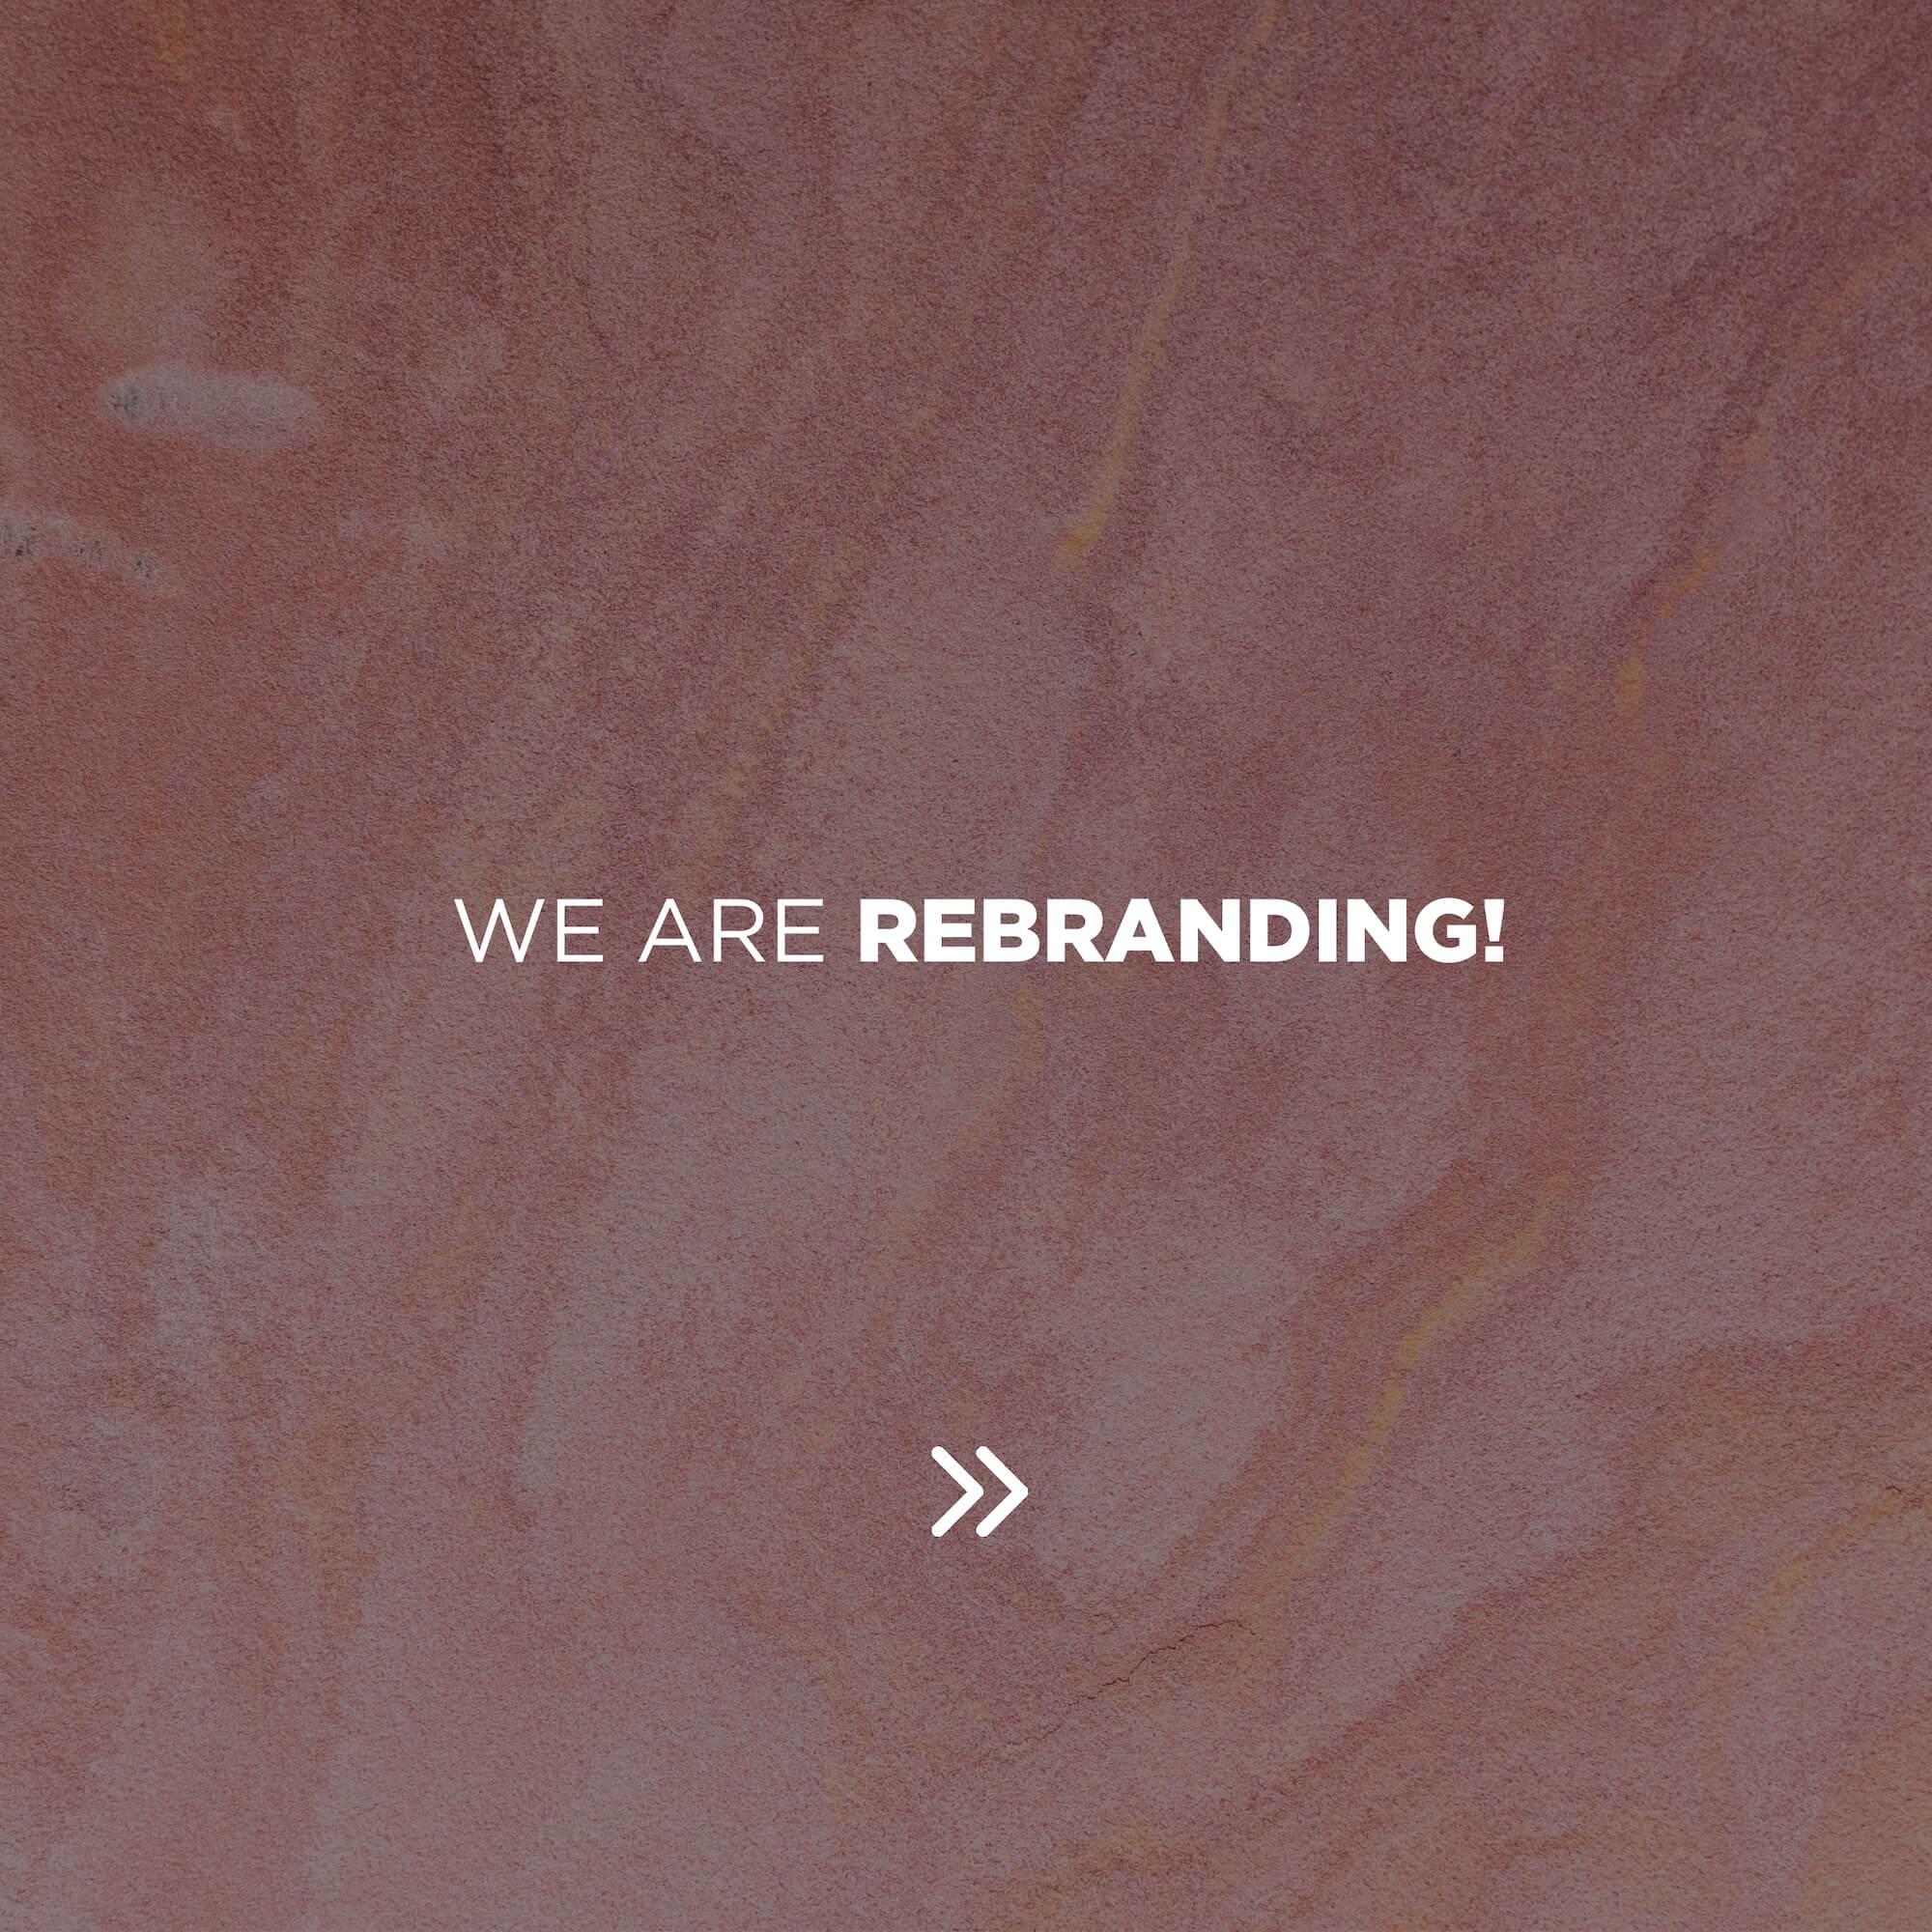 Rebrand to Celebration Church Netherlands